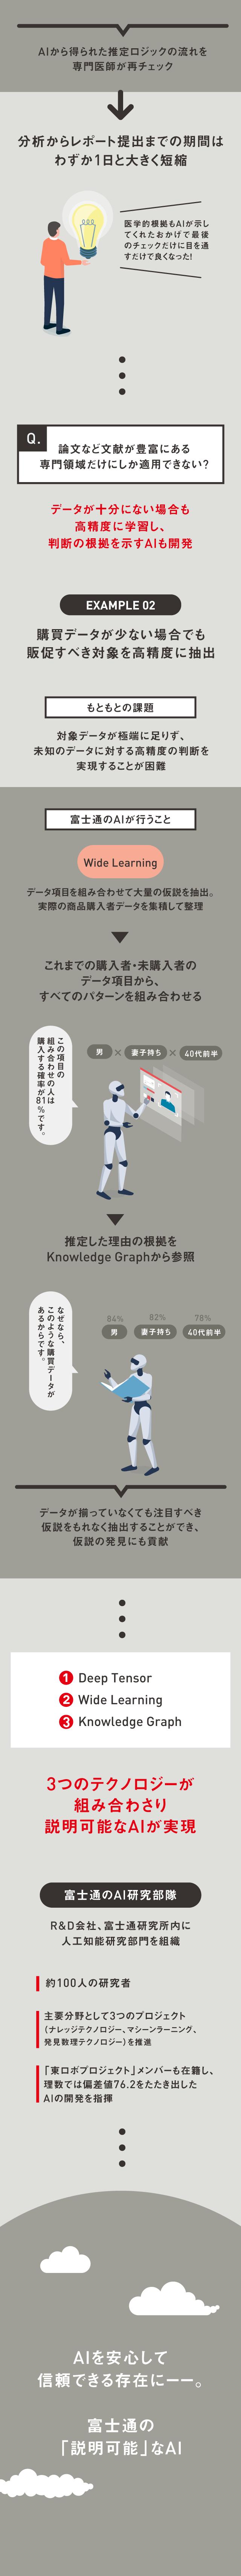 AIを安心して信頼できる存在にーー。富士通の「説明可能」なAI